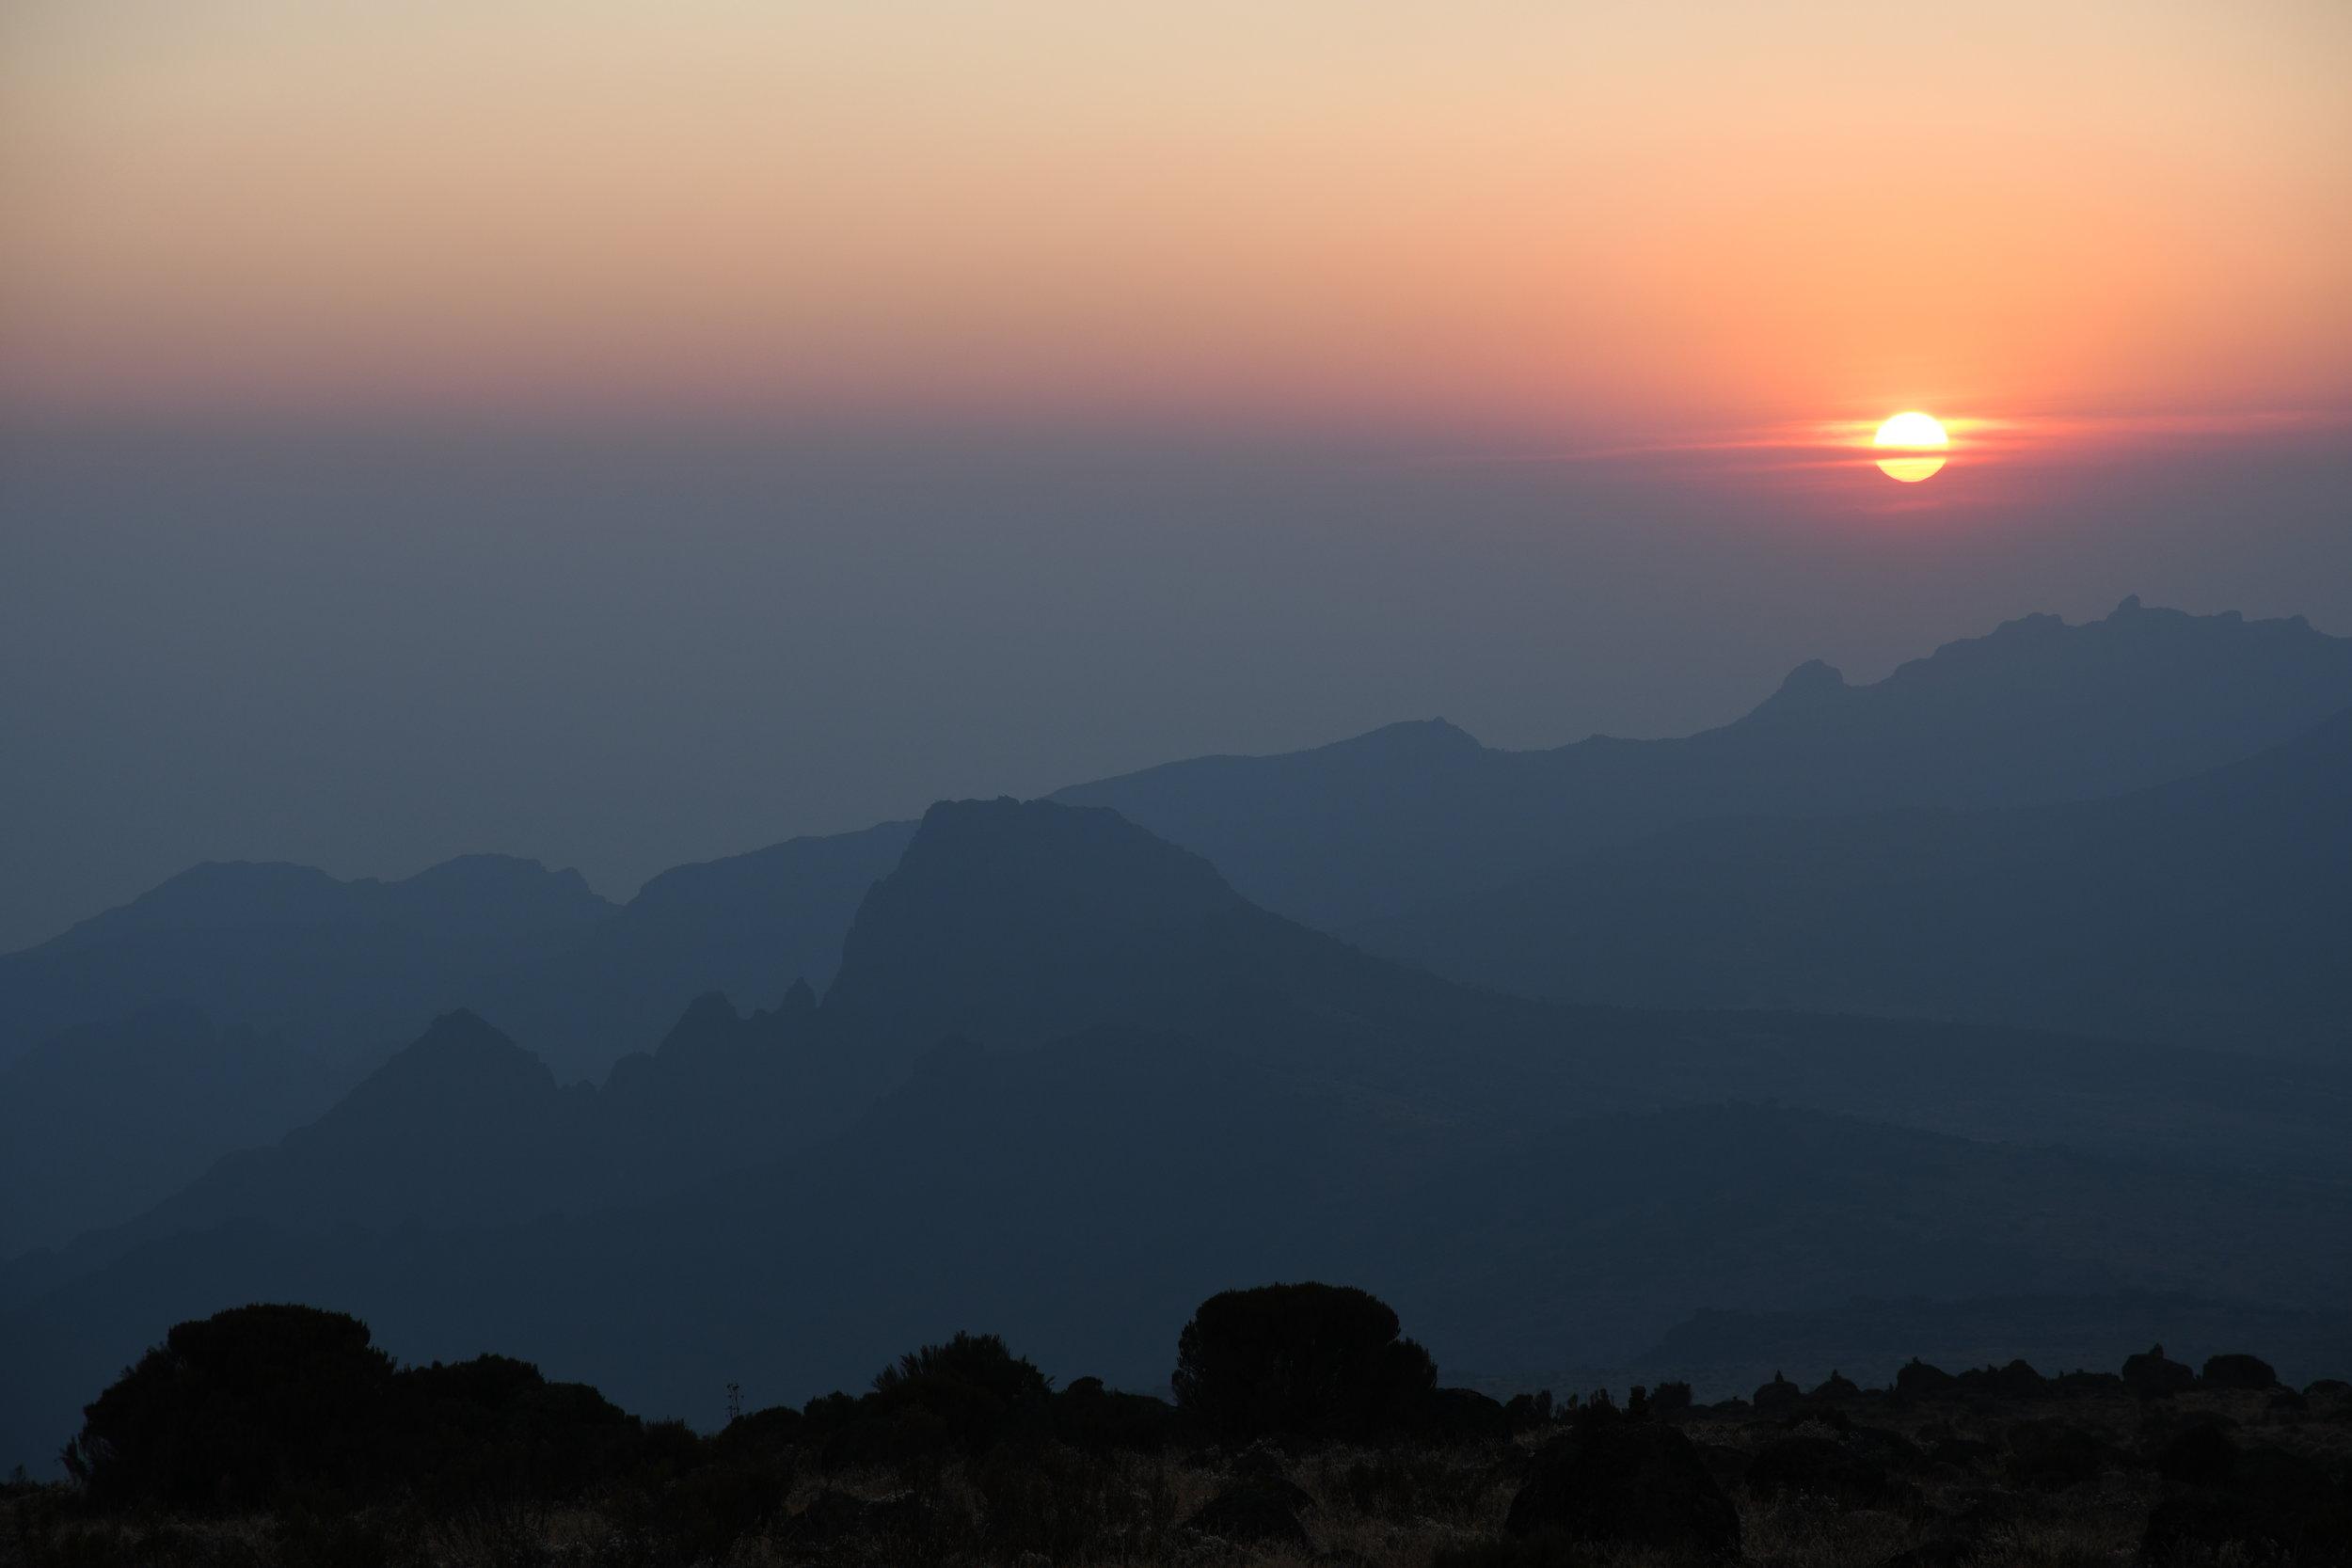 Day 3 / Sunset at Shira Camp